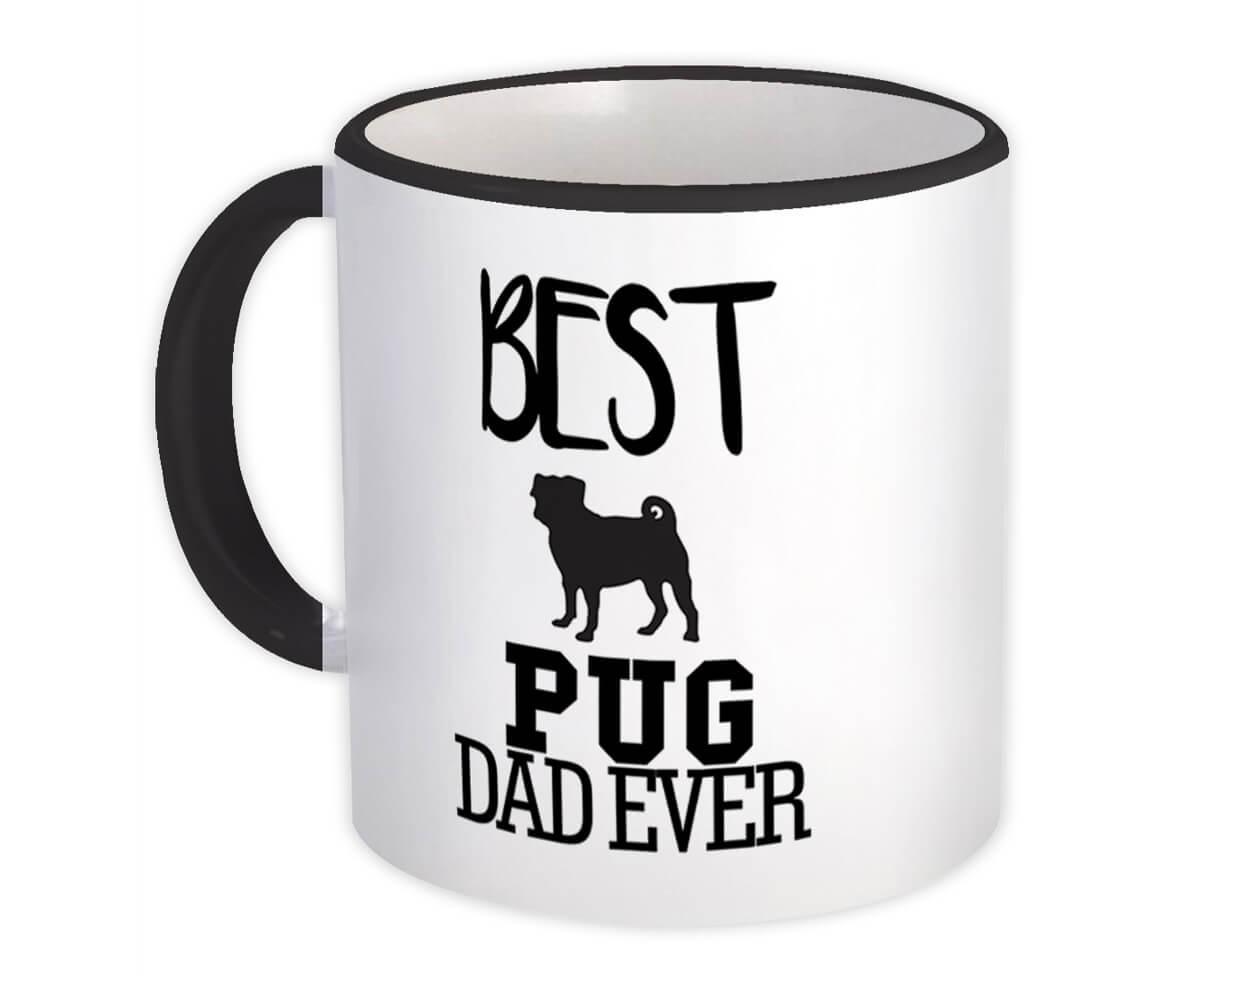 Best Pug Dad Ever : Gift Mug Dog Silhouette Funny Pet Cartoon Owner